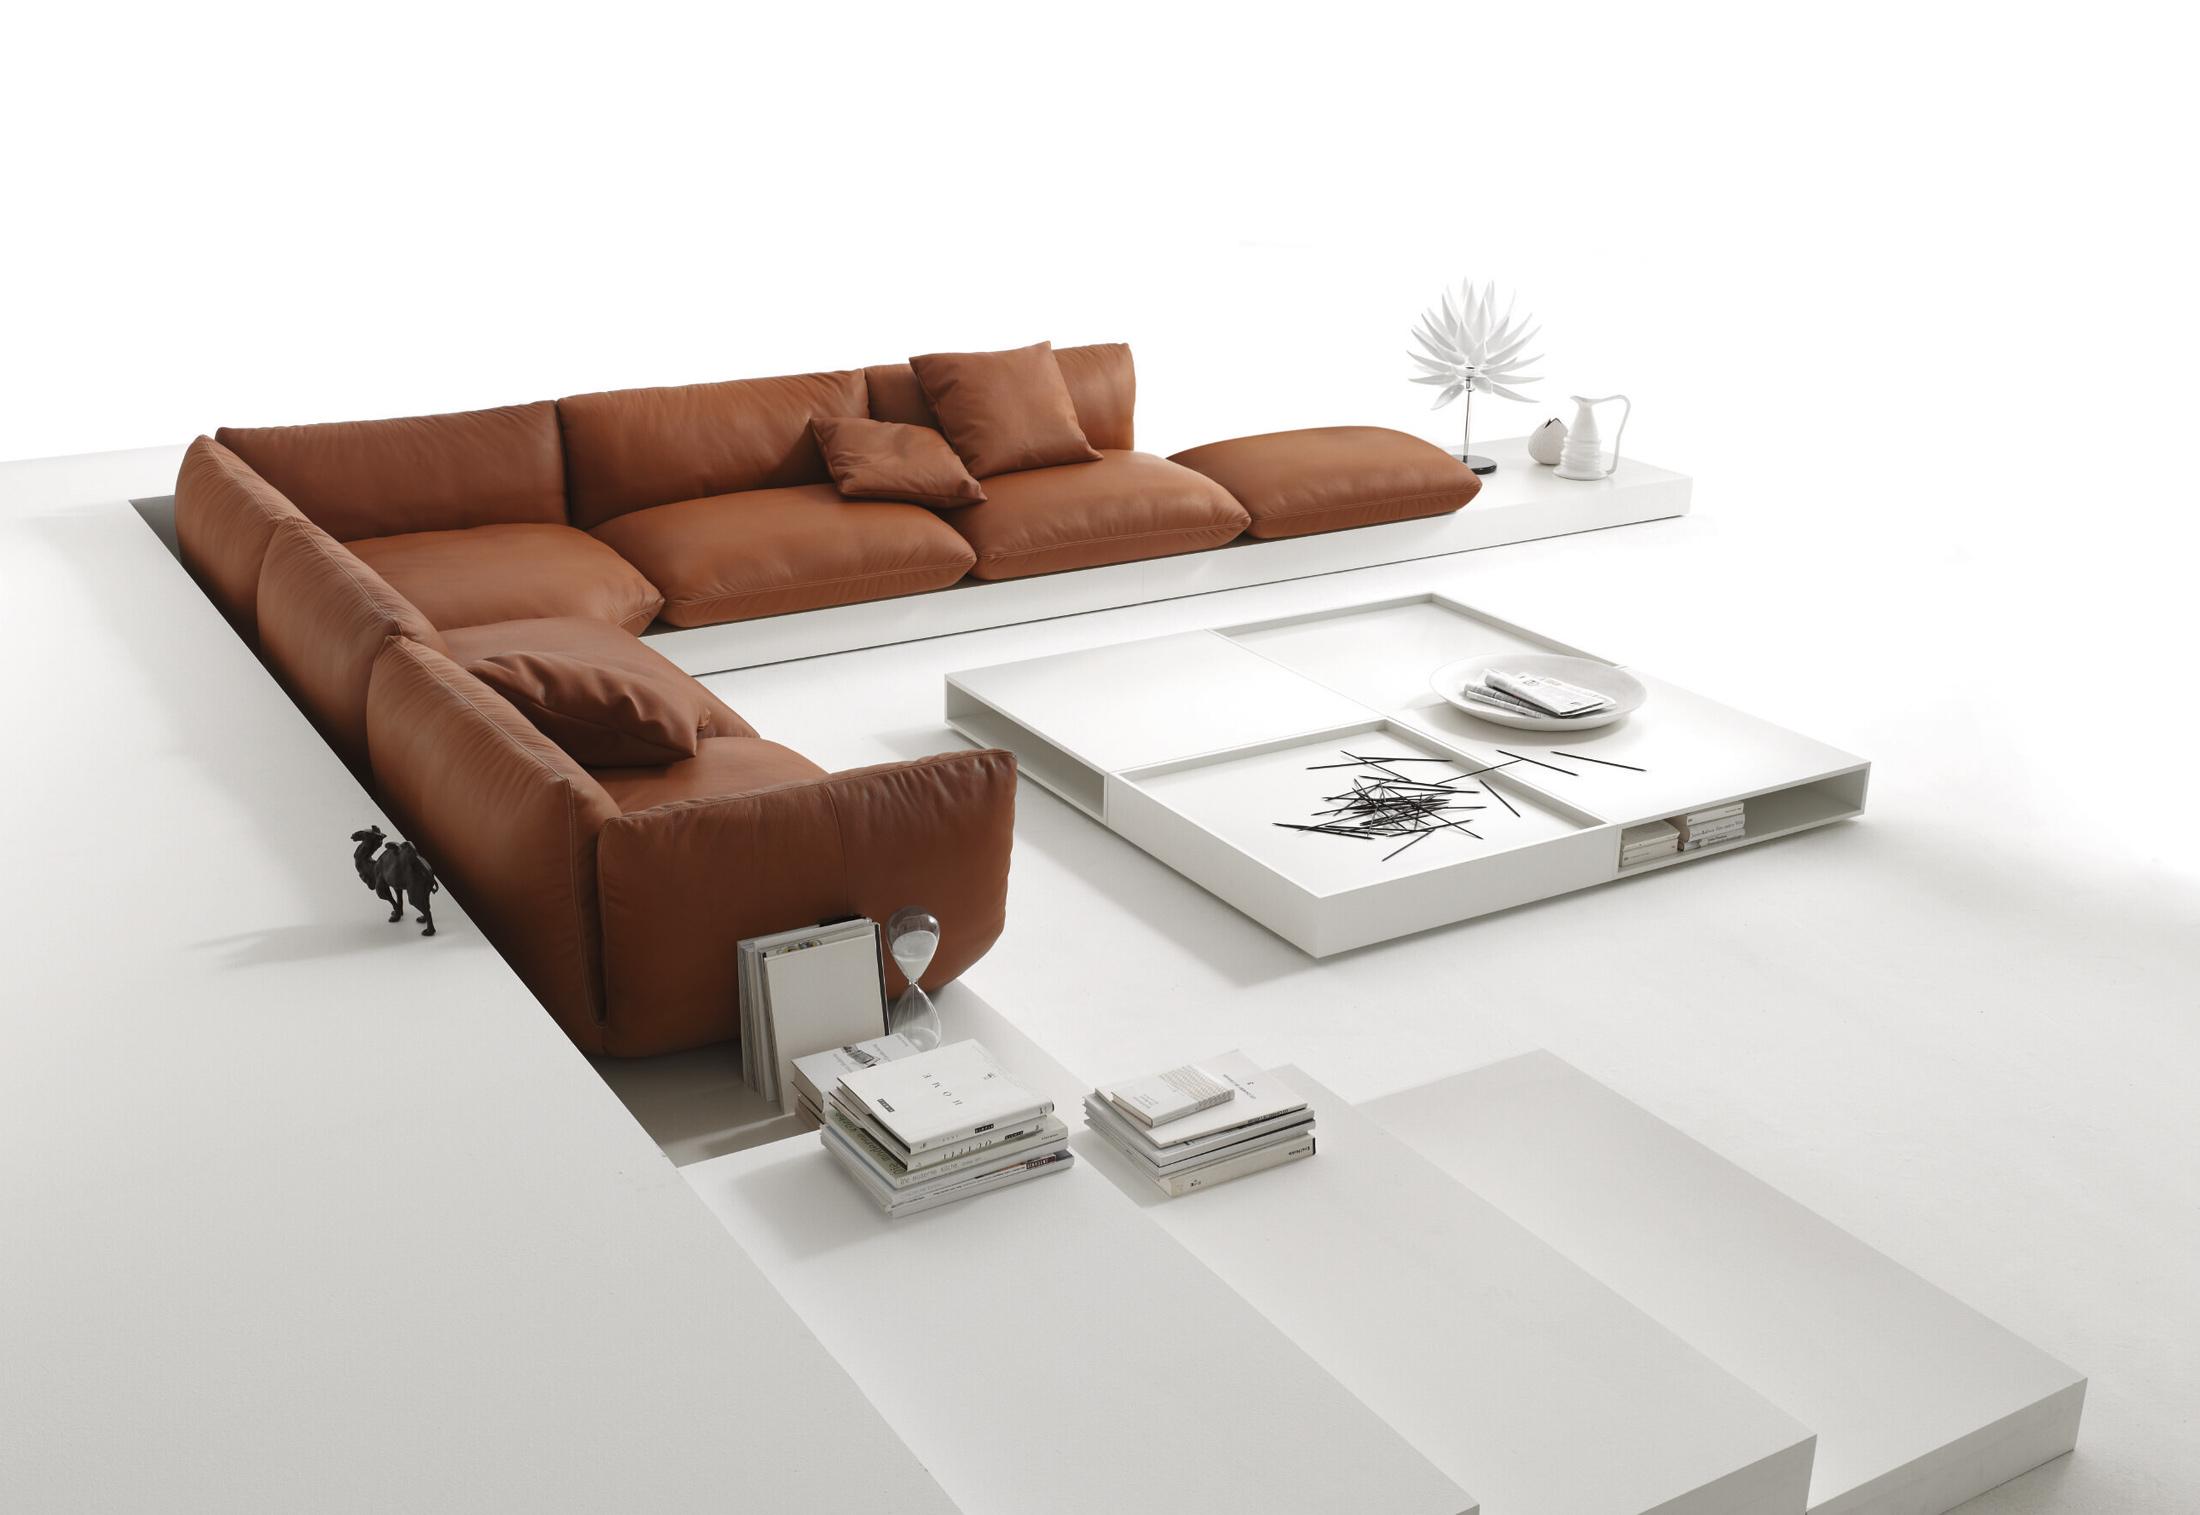 Jalis sofa by COR | STYLEPARK